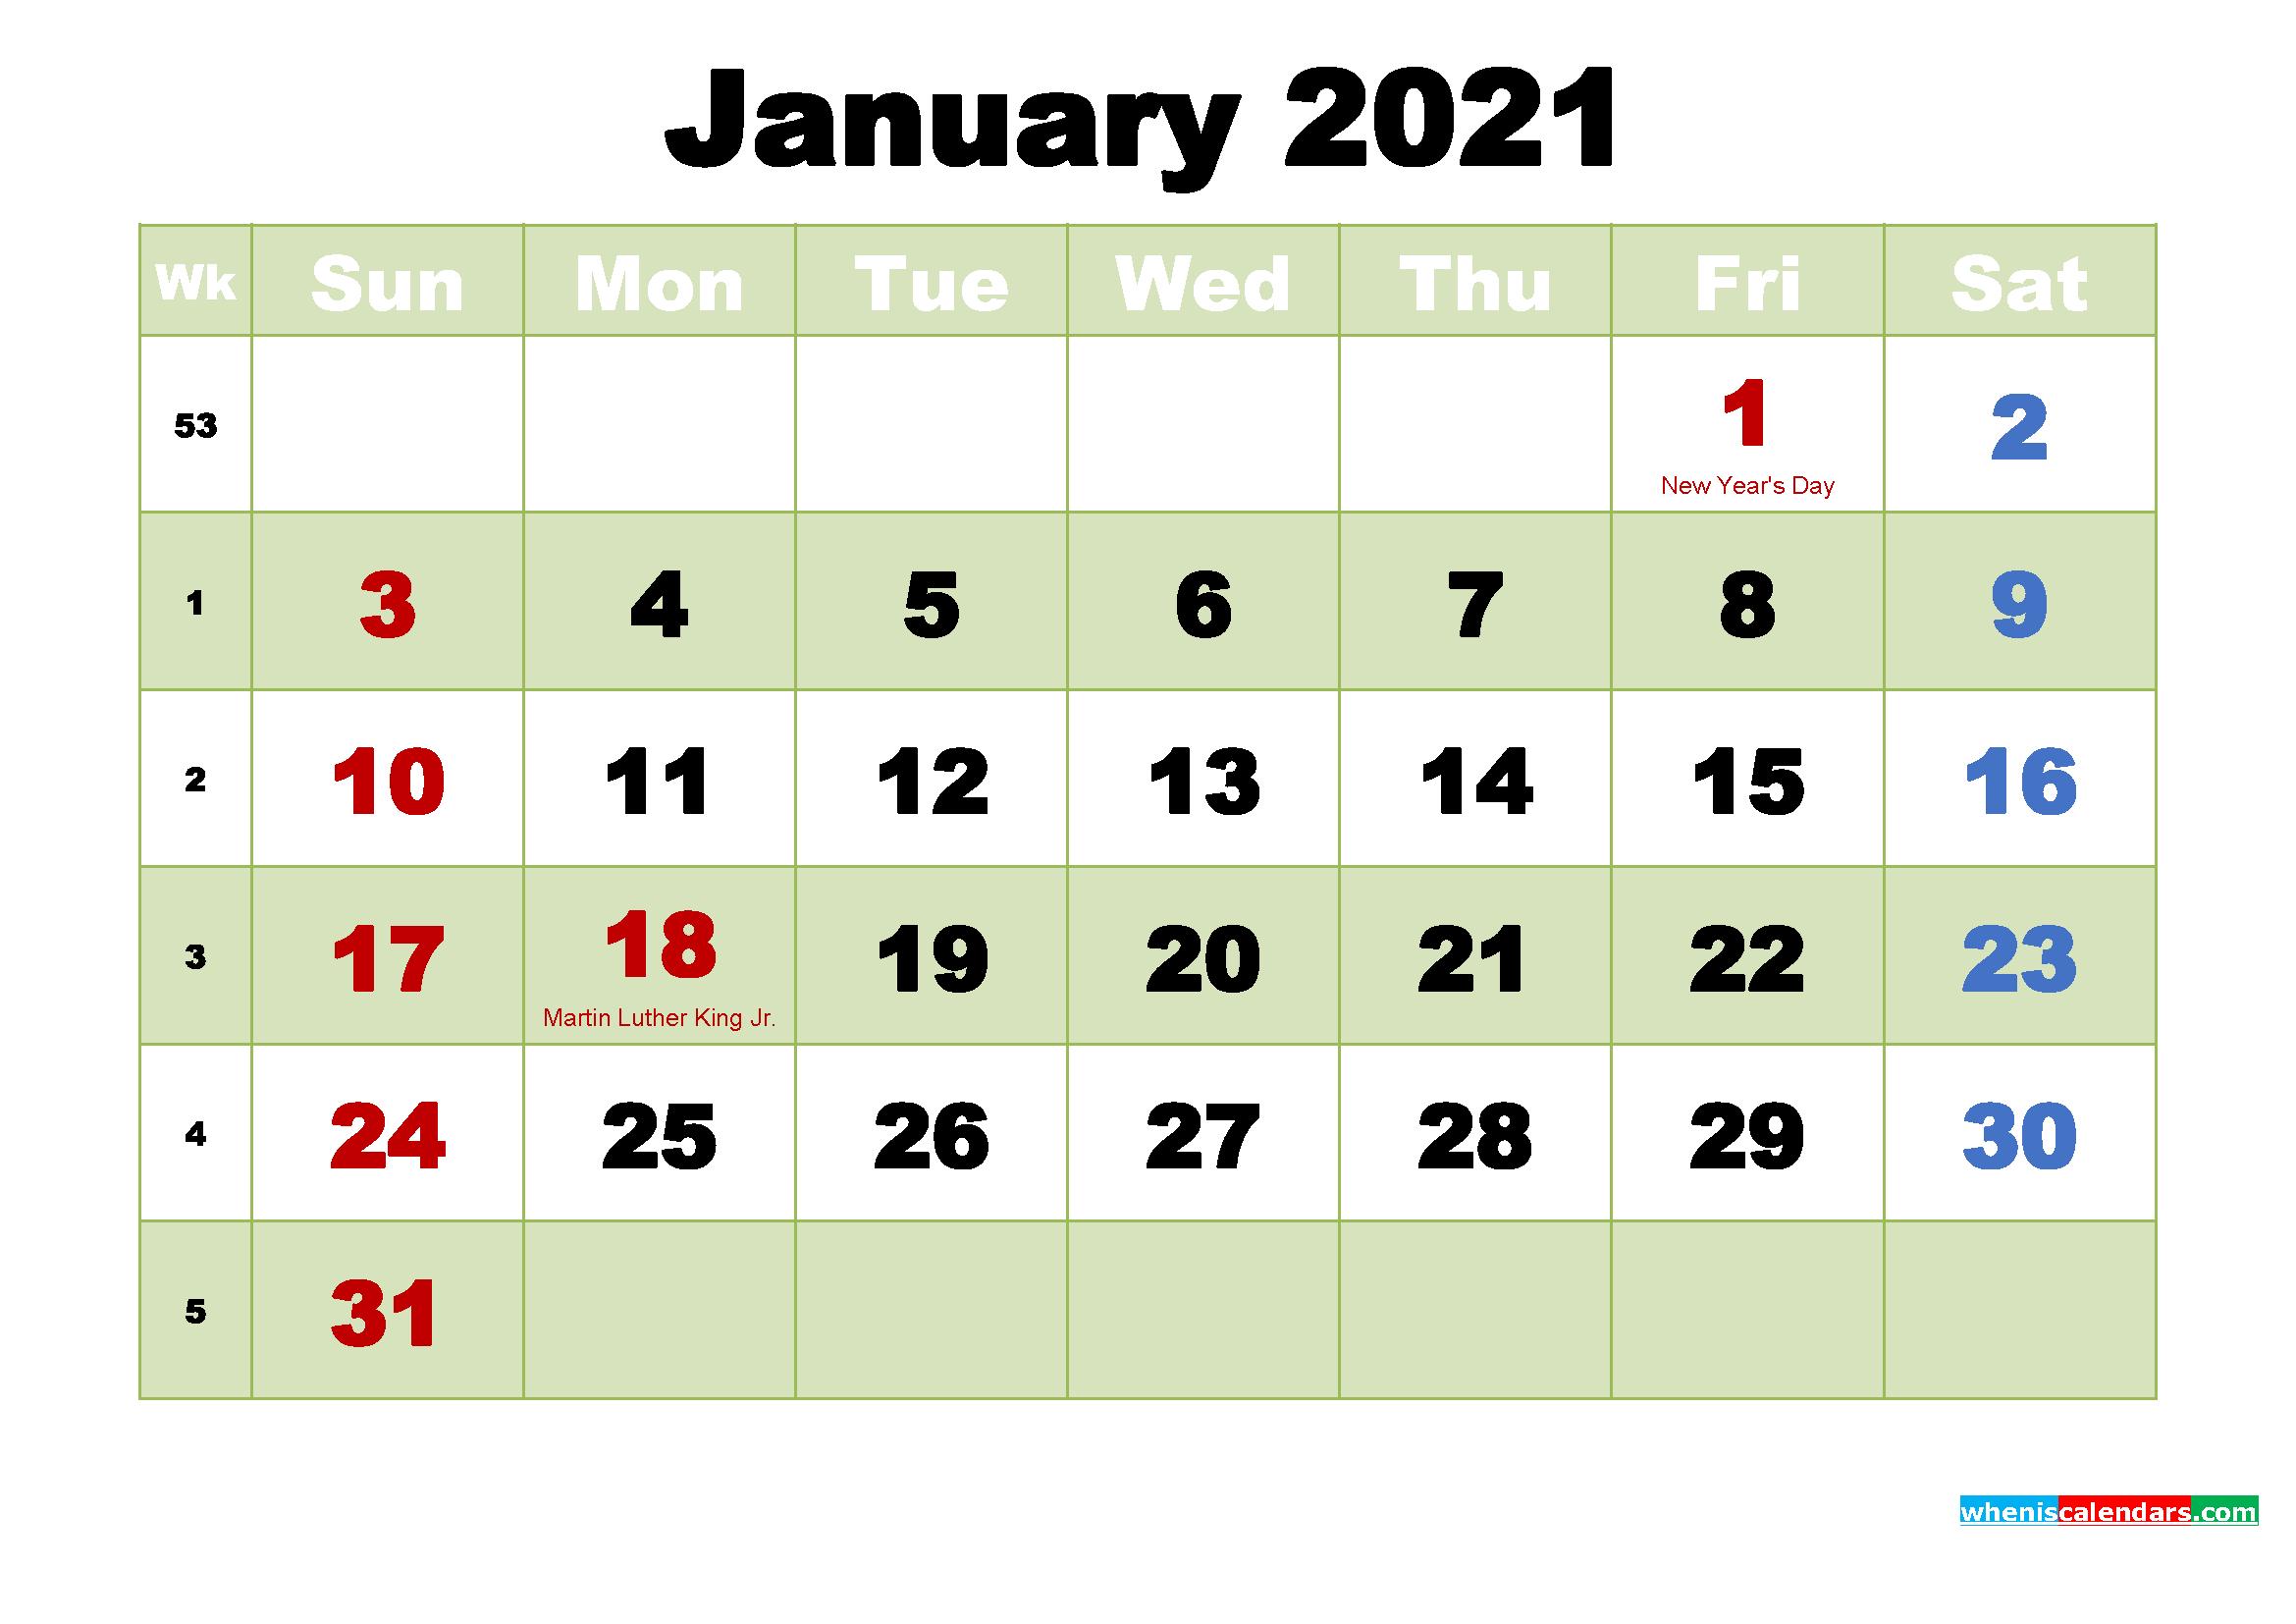 Free Printable January 2021 Calendar Wallpaper - 2011